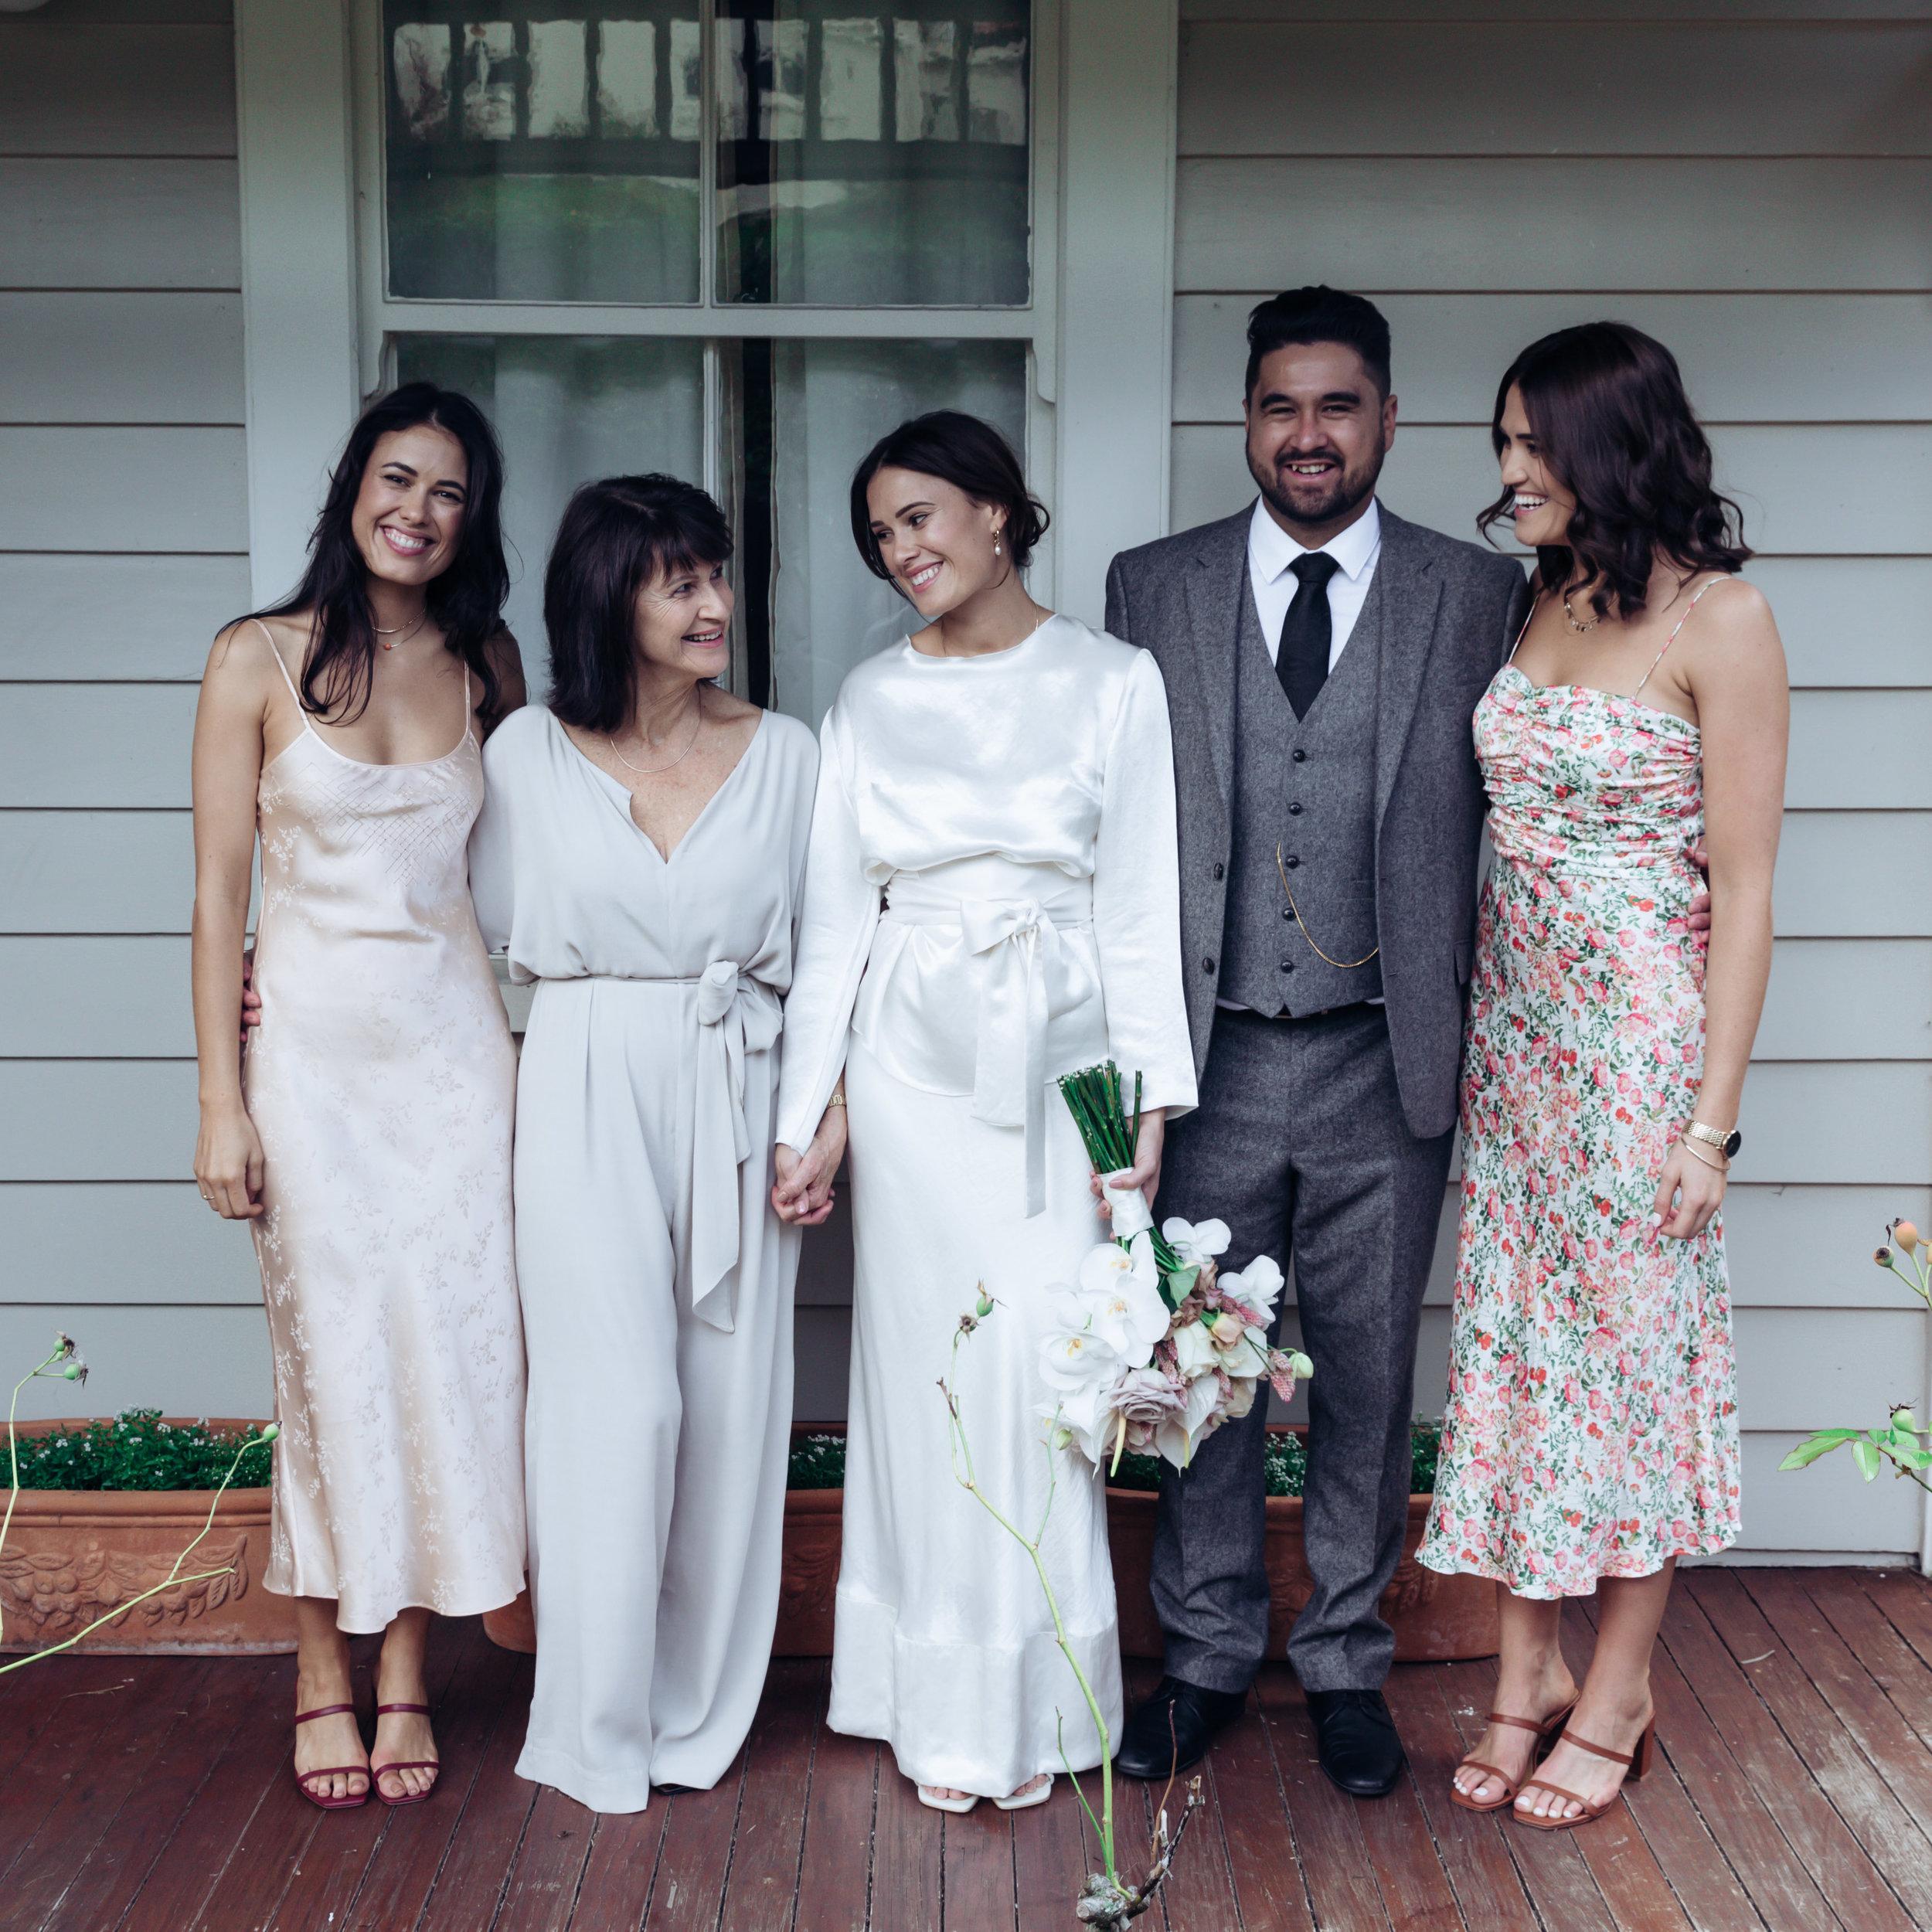 Wedding-Brooke Matt Menzies-Apr 2019-0470.jpg